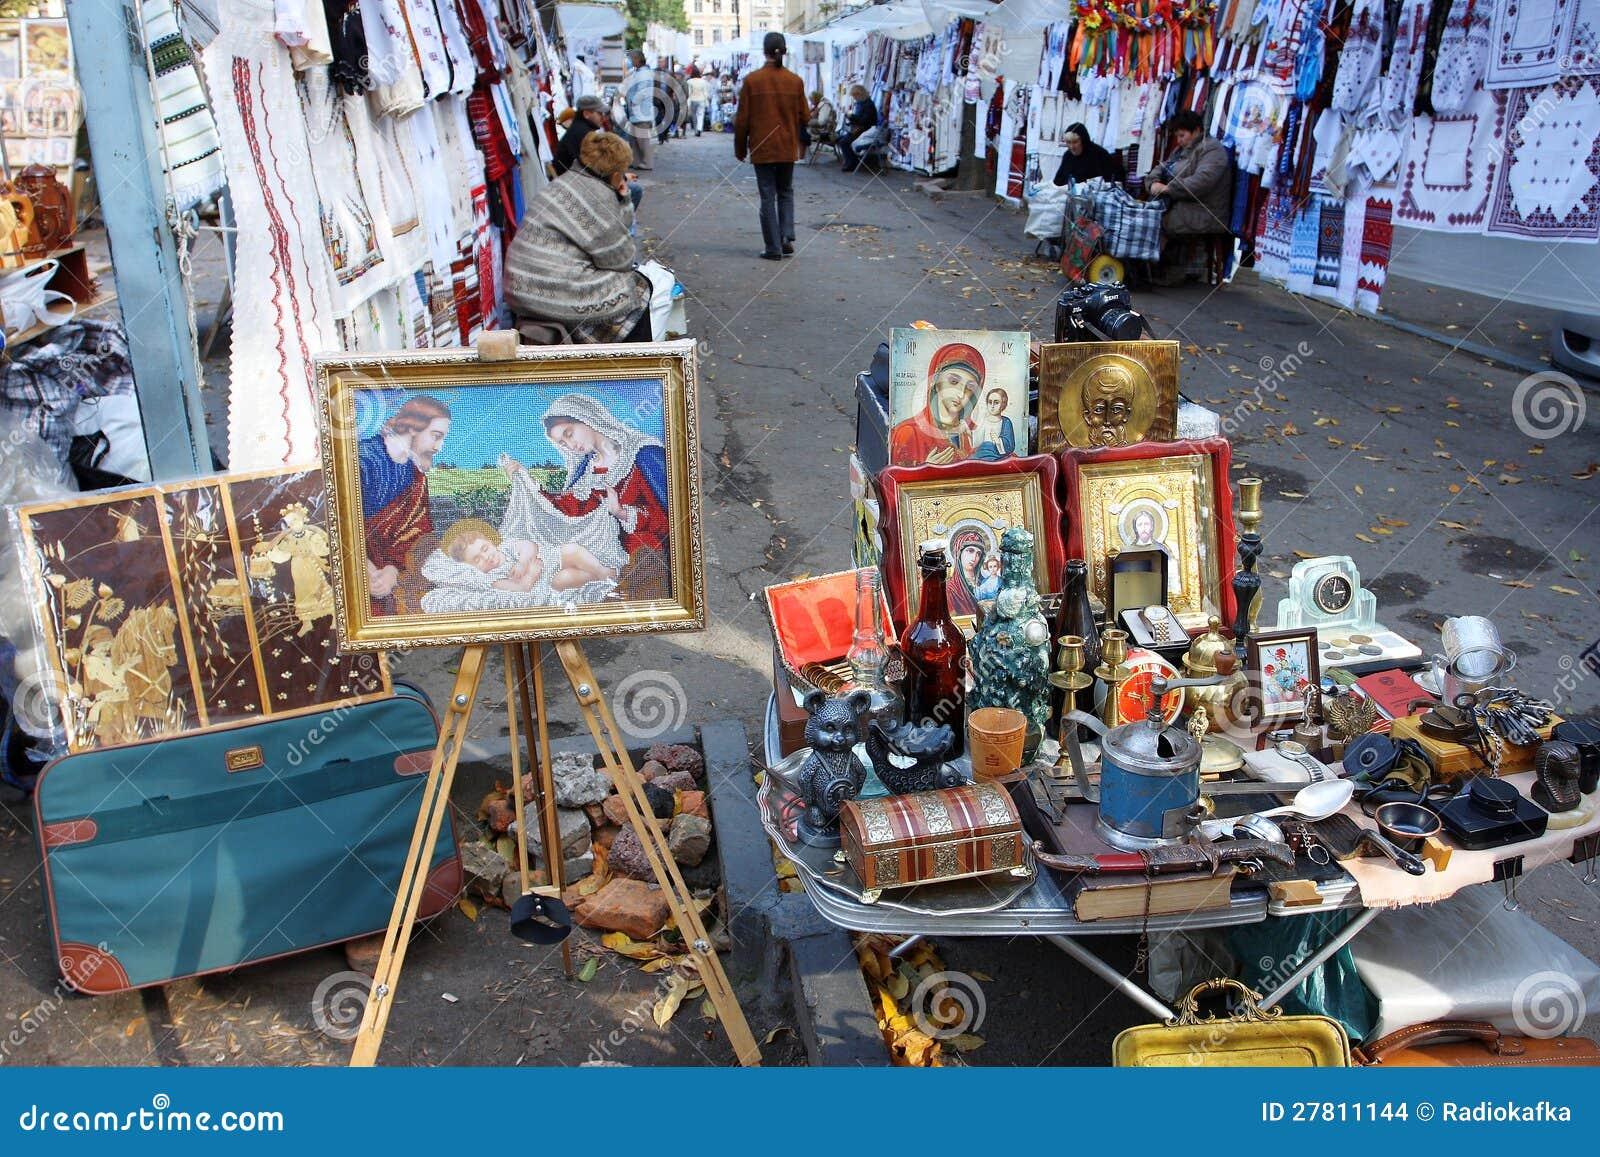 Outdoor Flea Markets @BBT.com